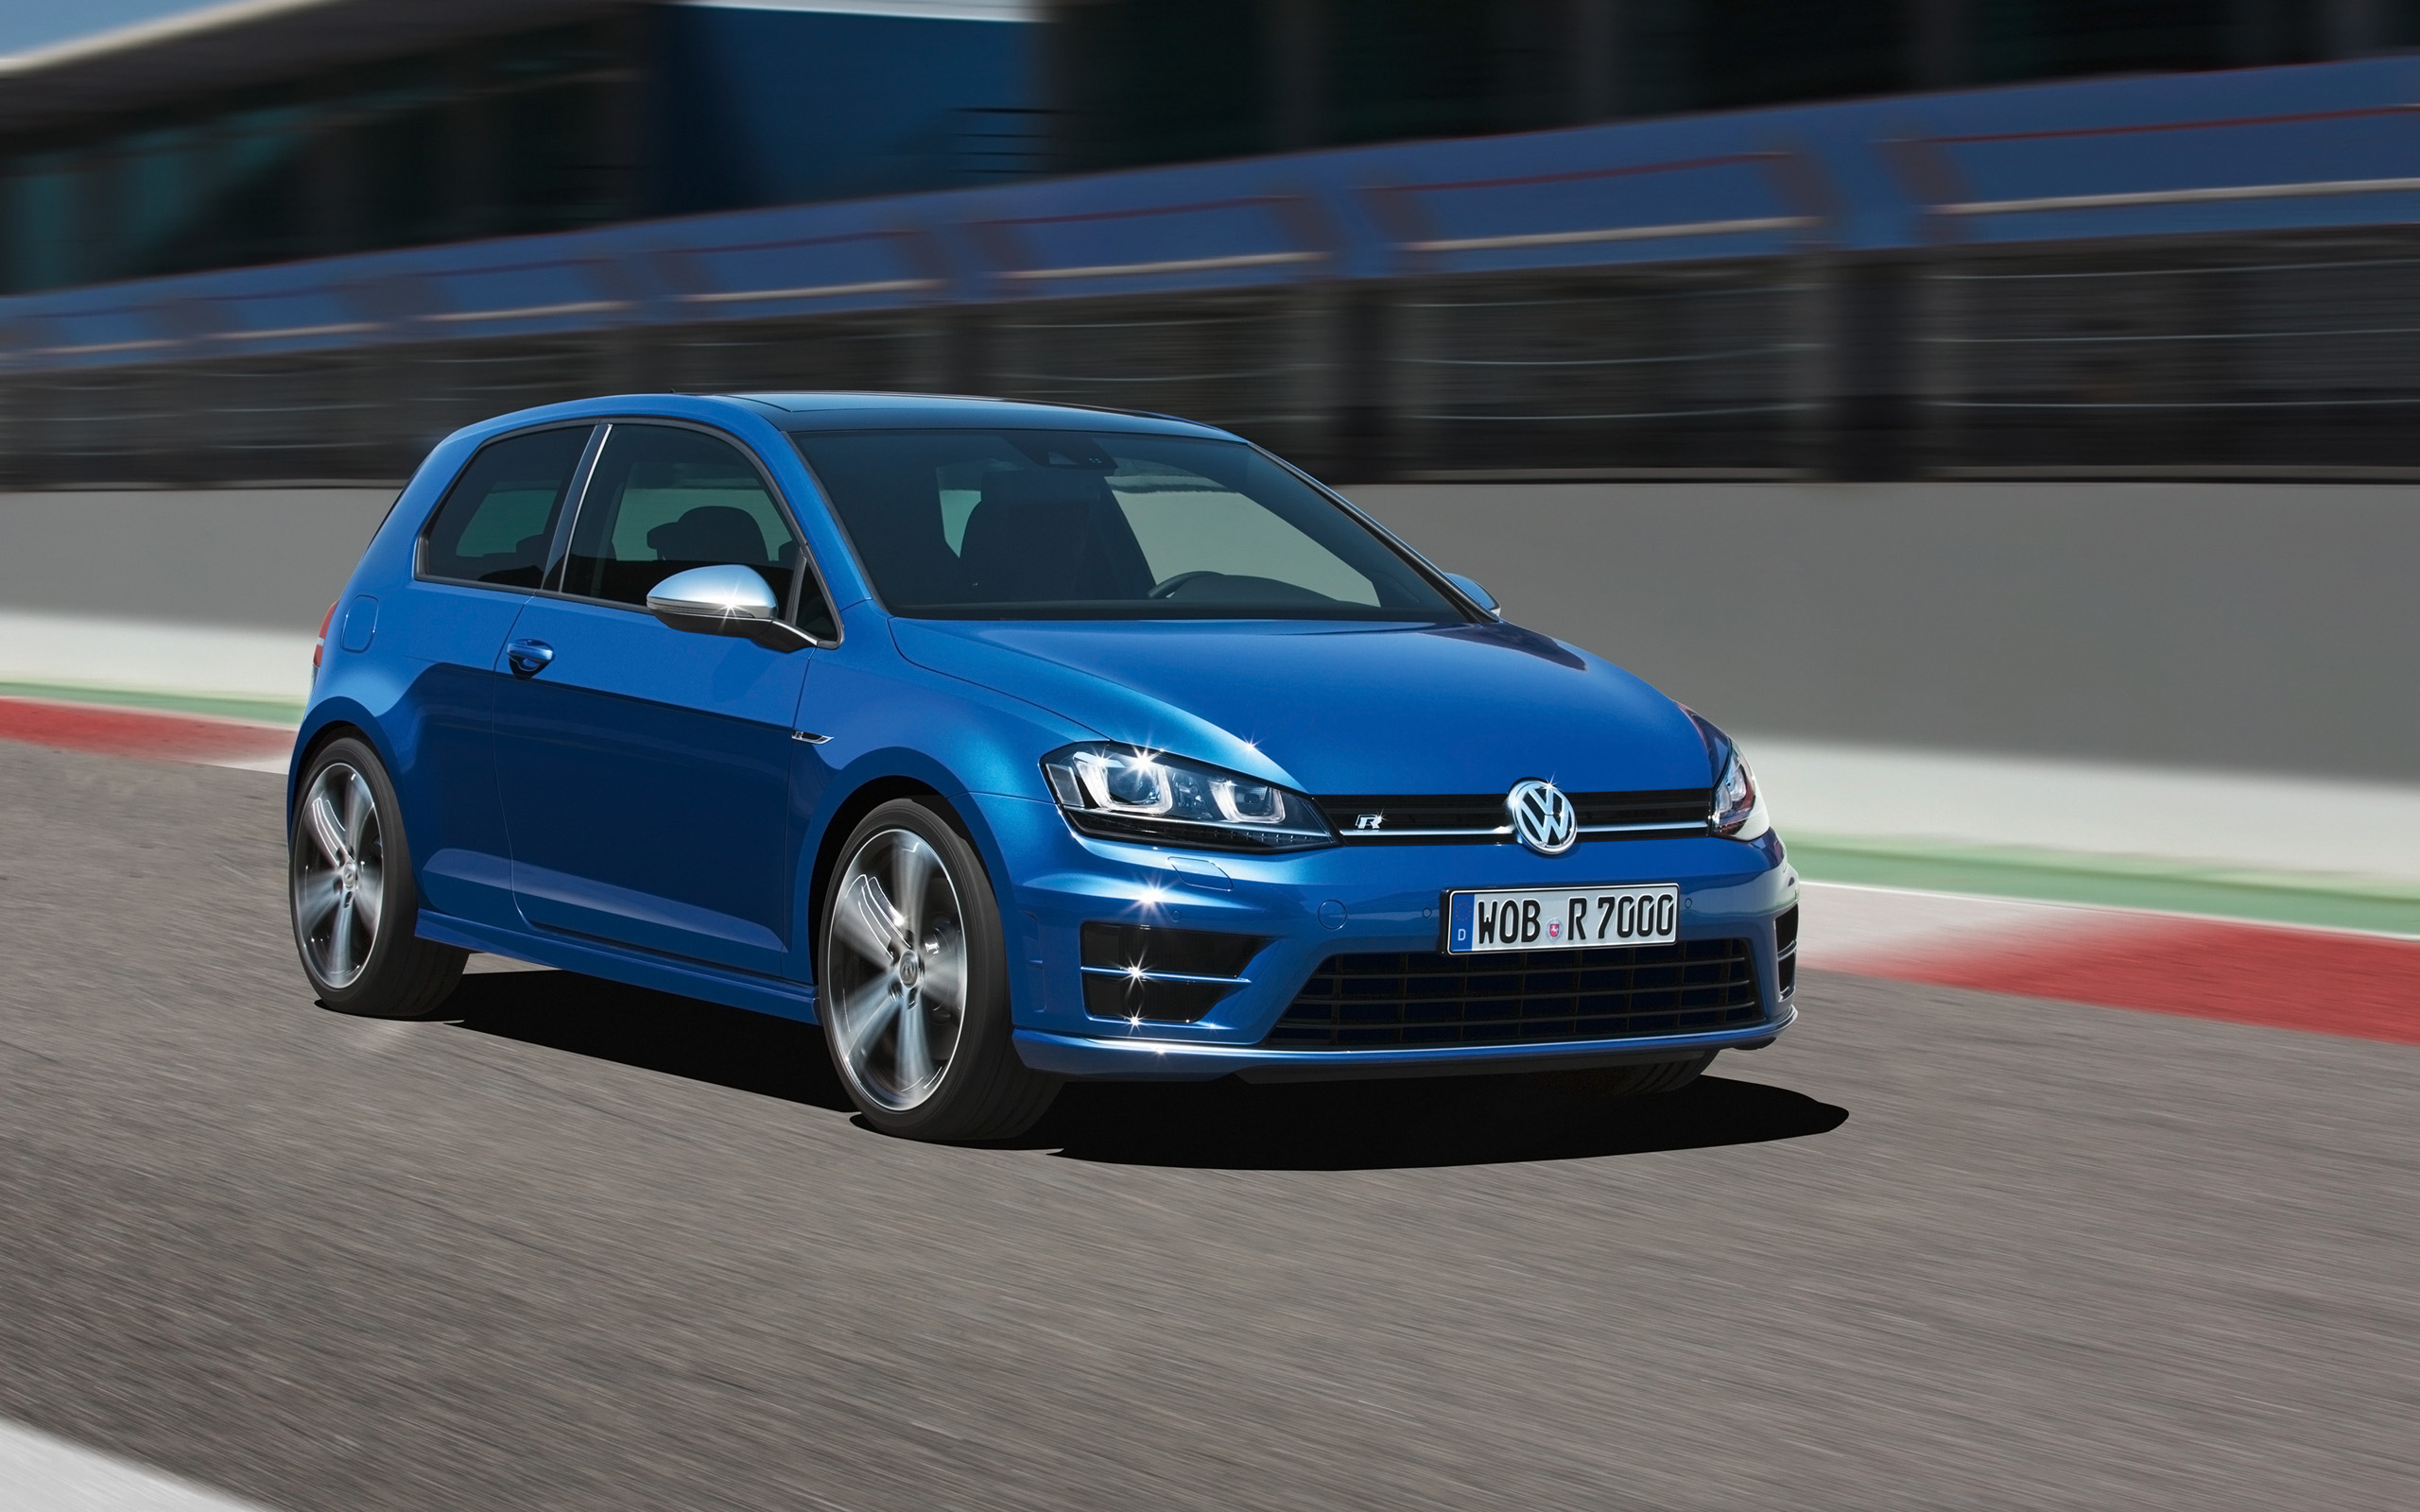 2014 Volkswagen Golf R golf r h wallpaper 2560x1600 155082 2560x1600